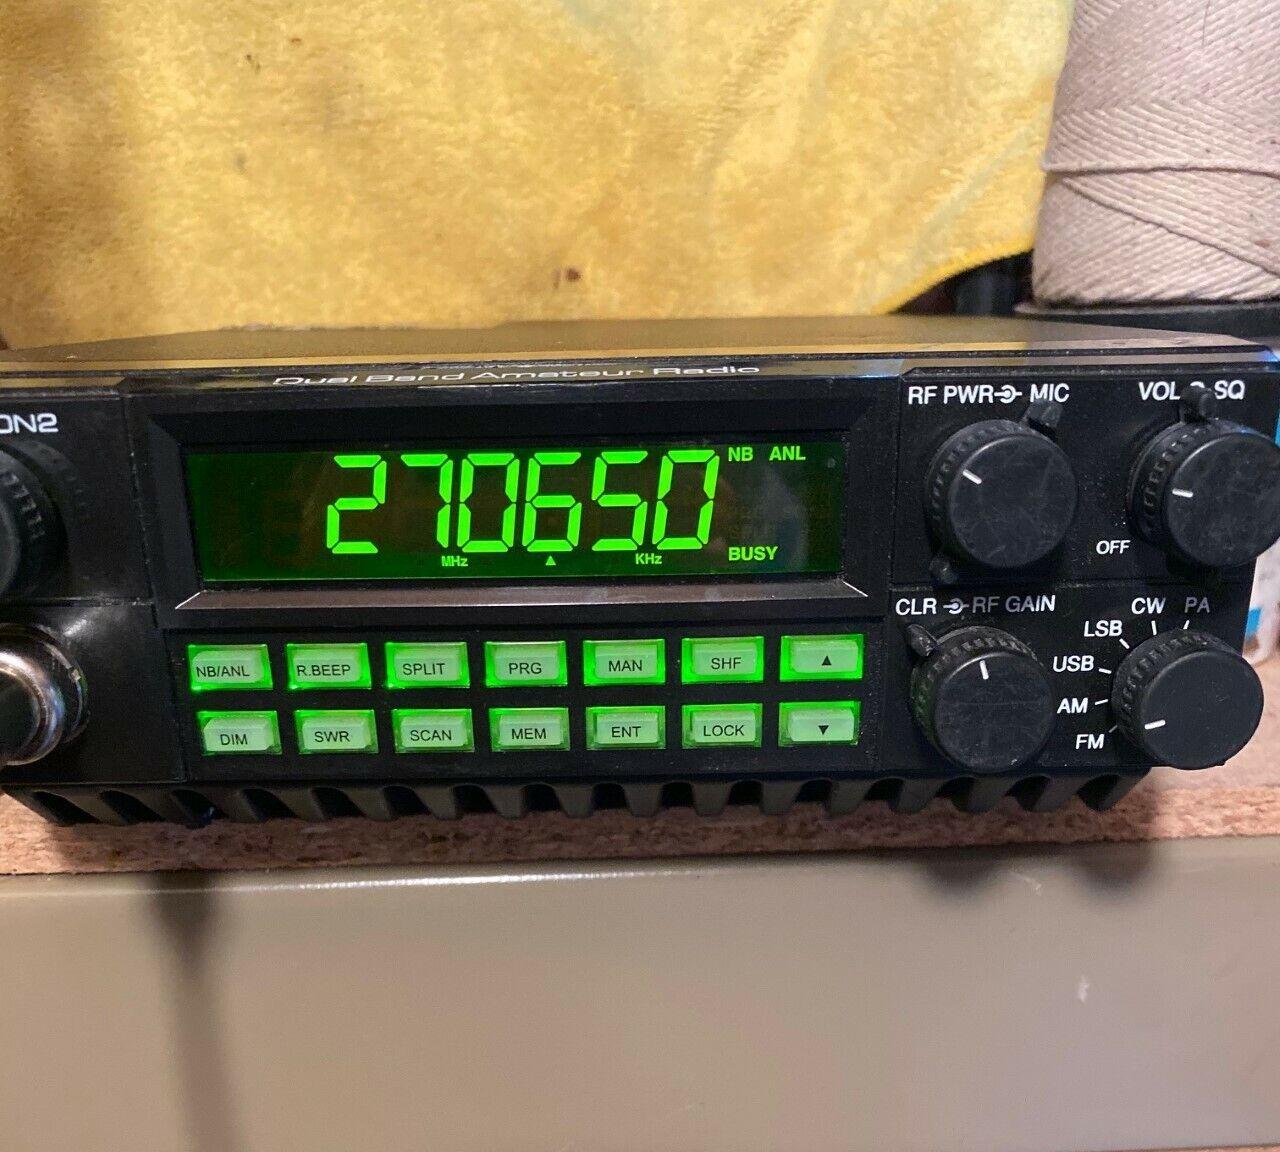 Ranger RCI 2970N2 w/ N4 Conversion. Buy it now for 650.00